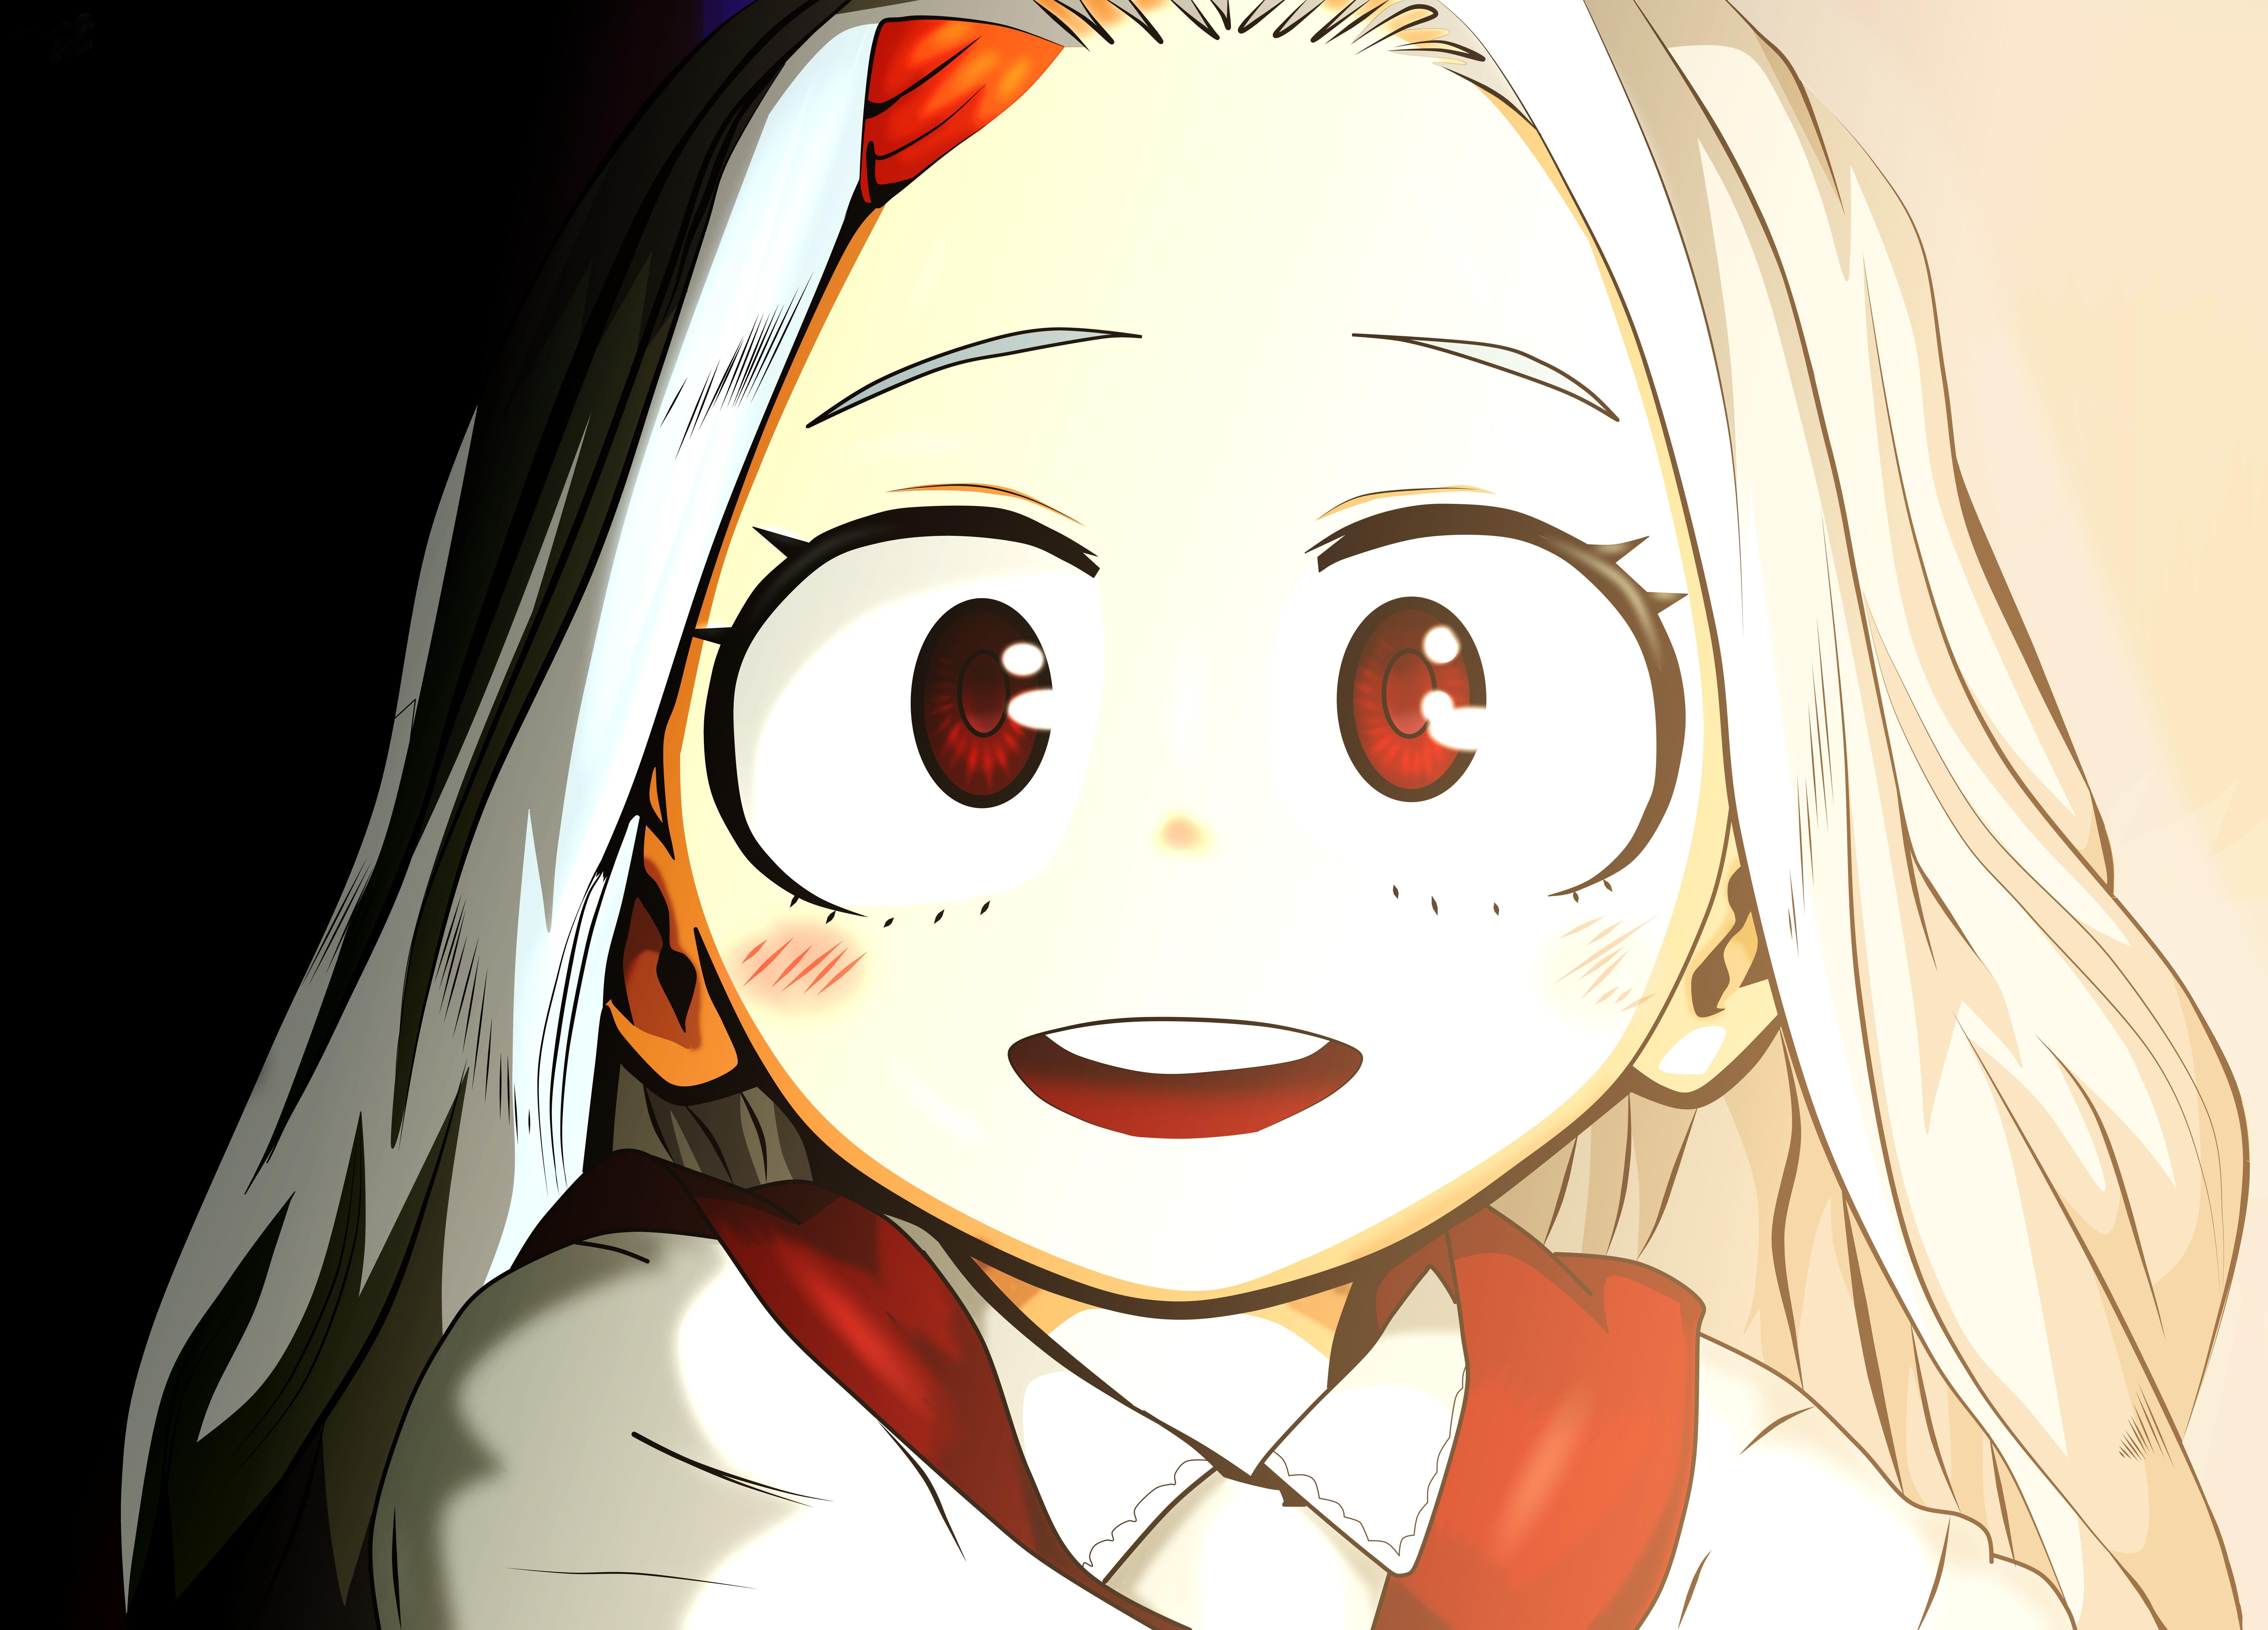 Eri Boku No Hero Academia My Hero Acadamia Anime Anime Girls 8k Wallpaper Hdwallpaper Desktop Anime Hero My Hero Academia